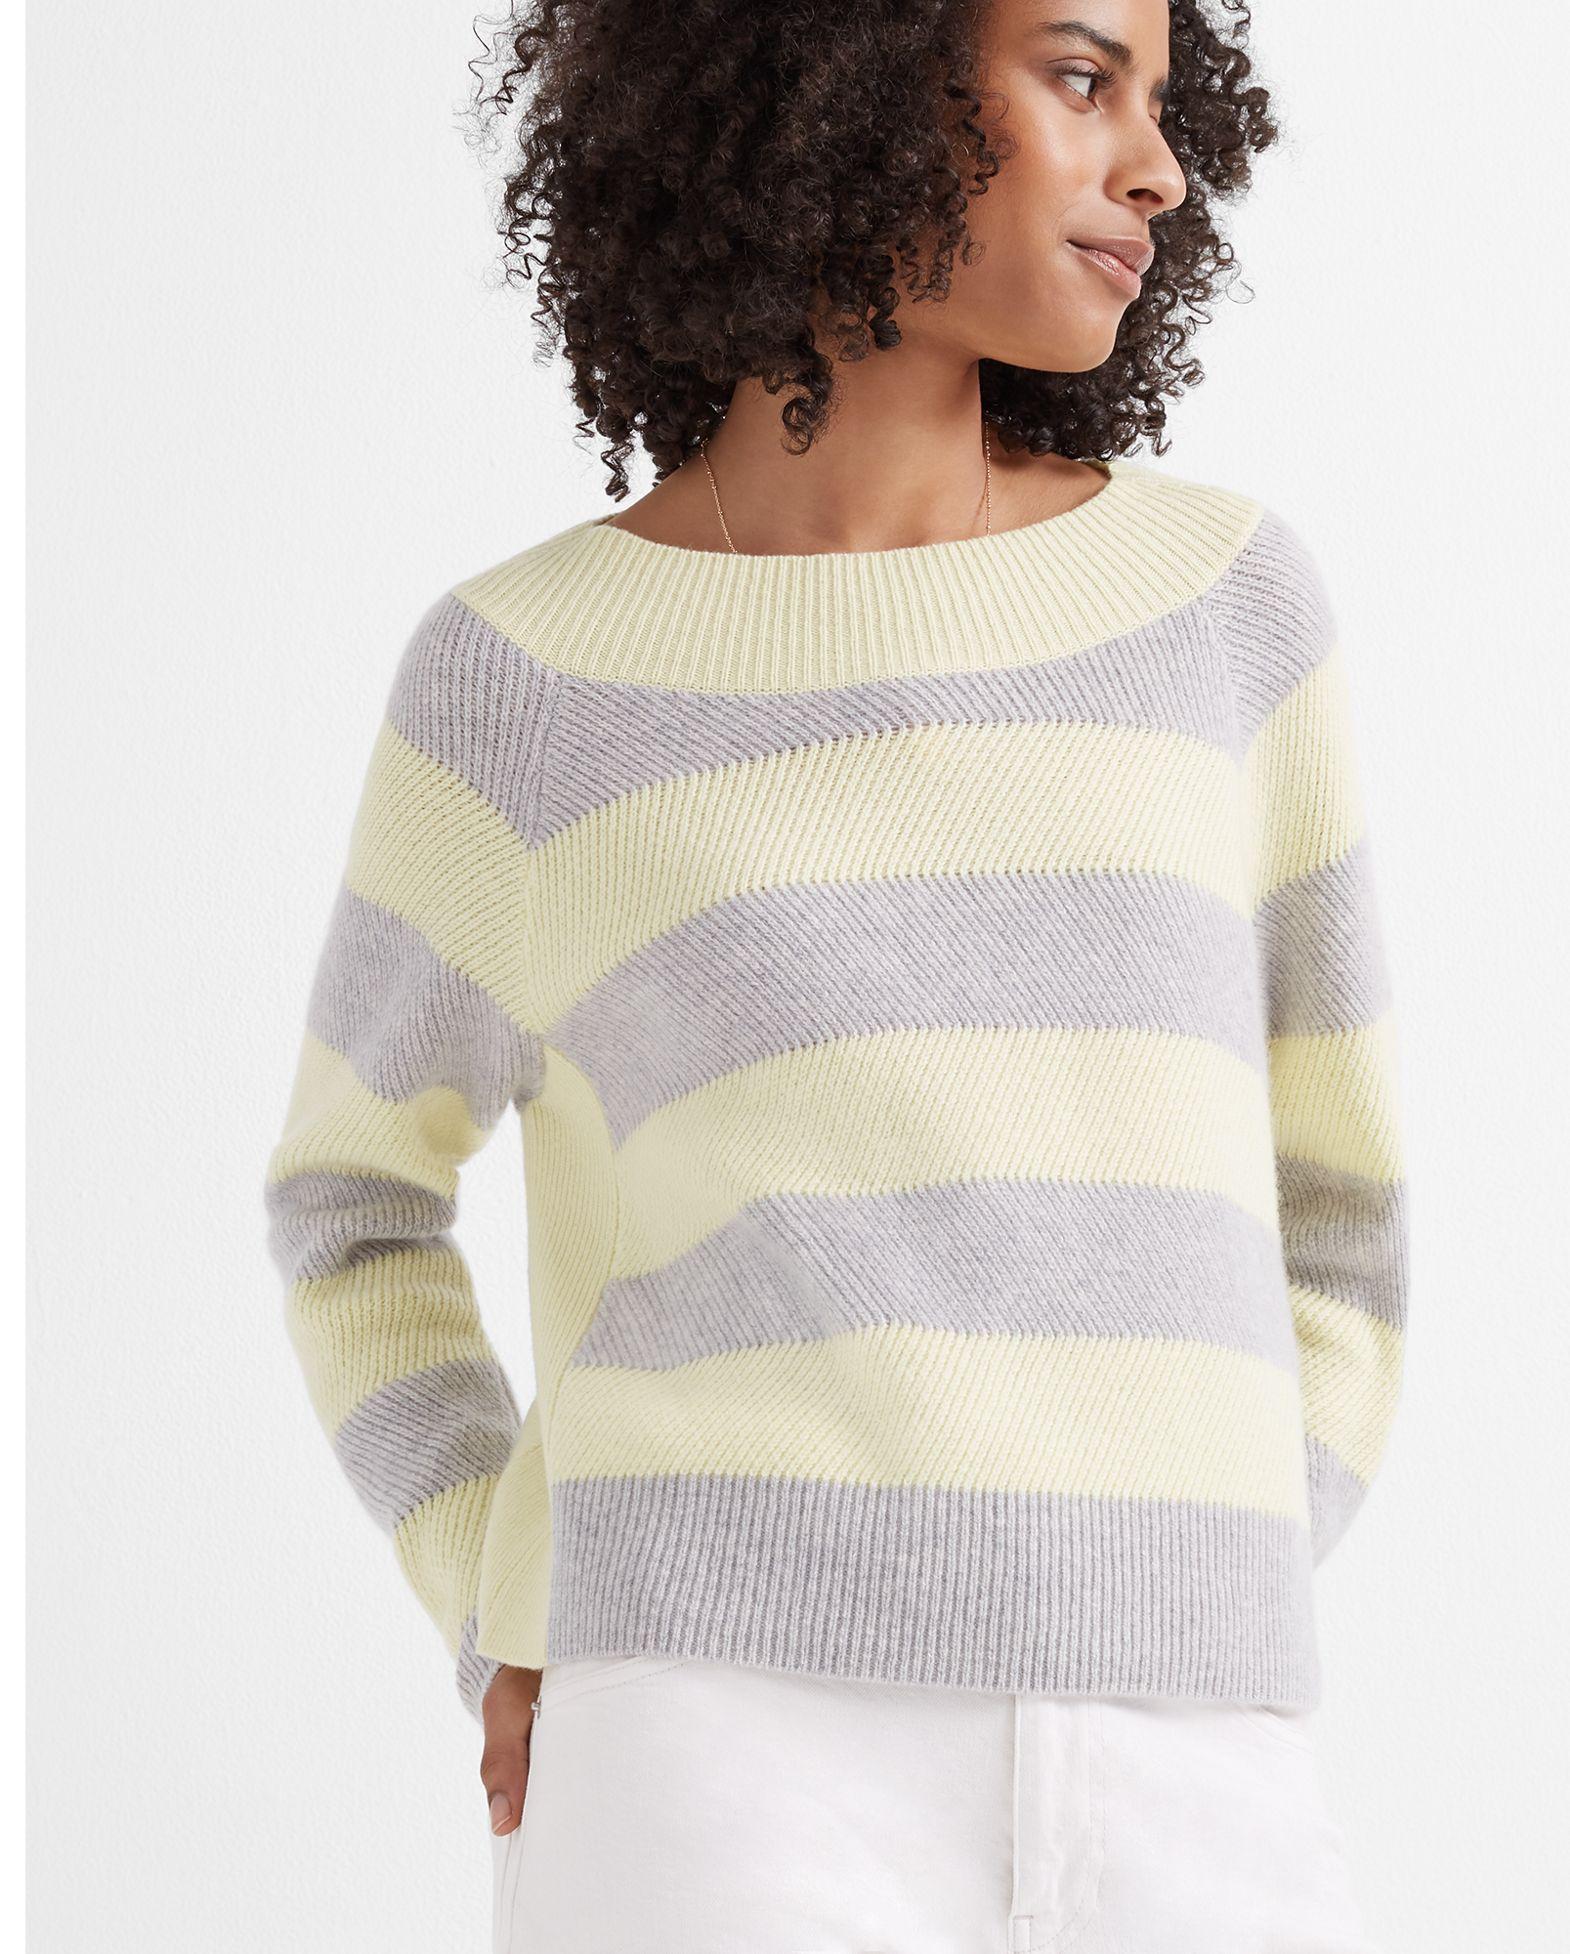 Racked Stitch Cashmere Sweater